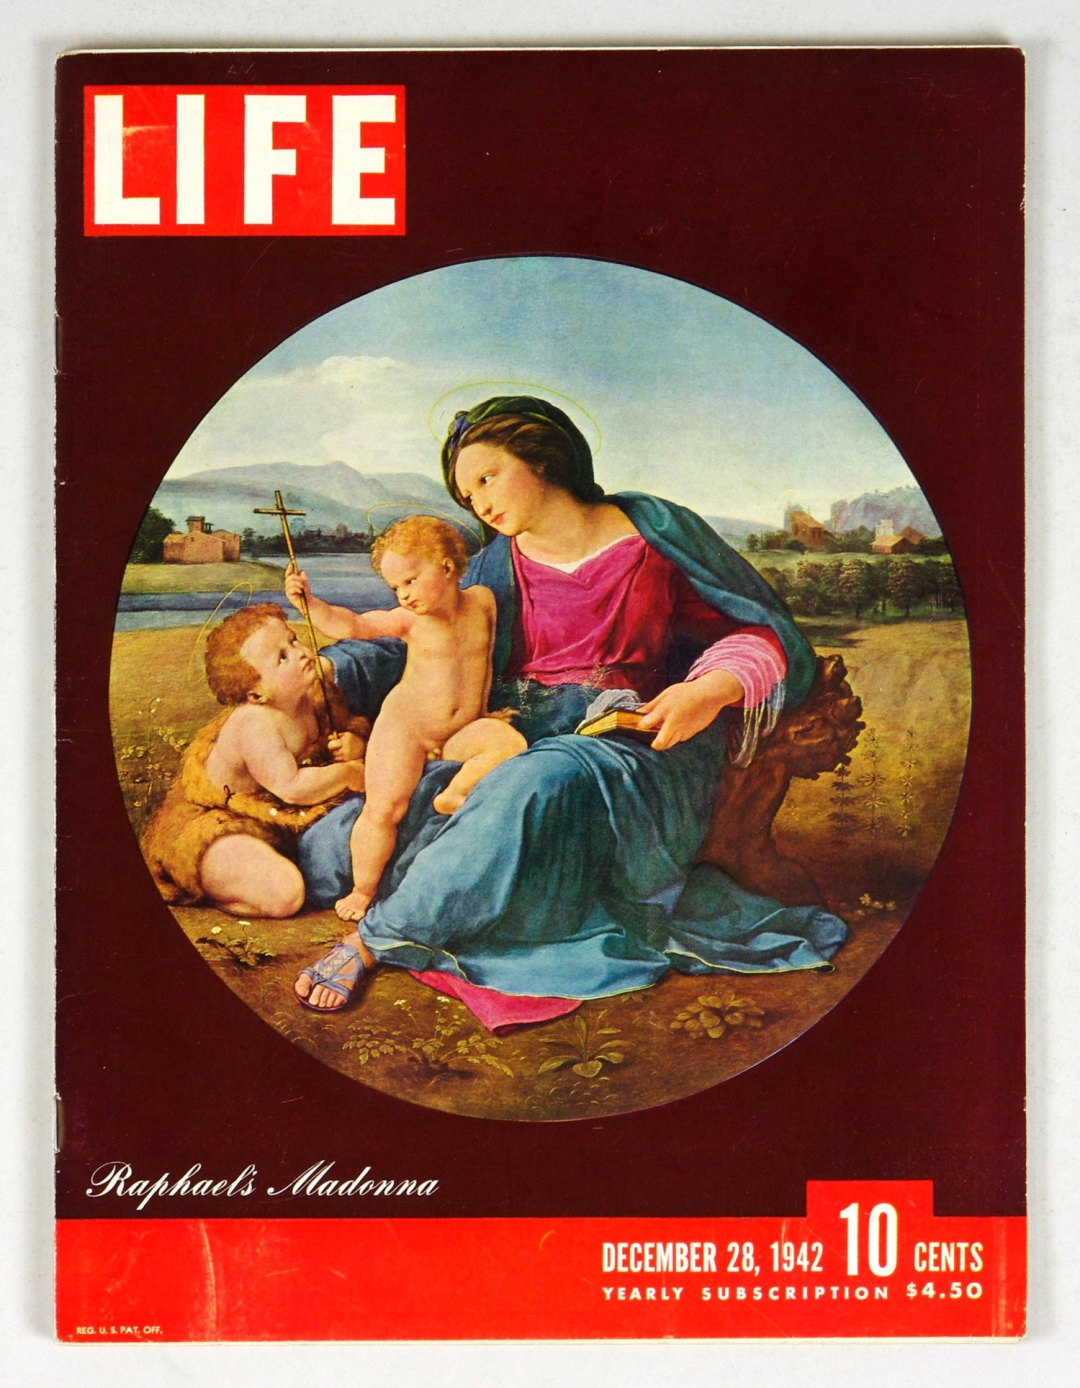 LIFE Magazine 1942 December 28 Raphael's Madonna